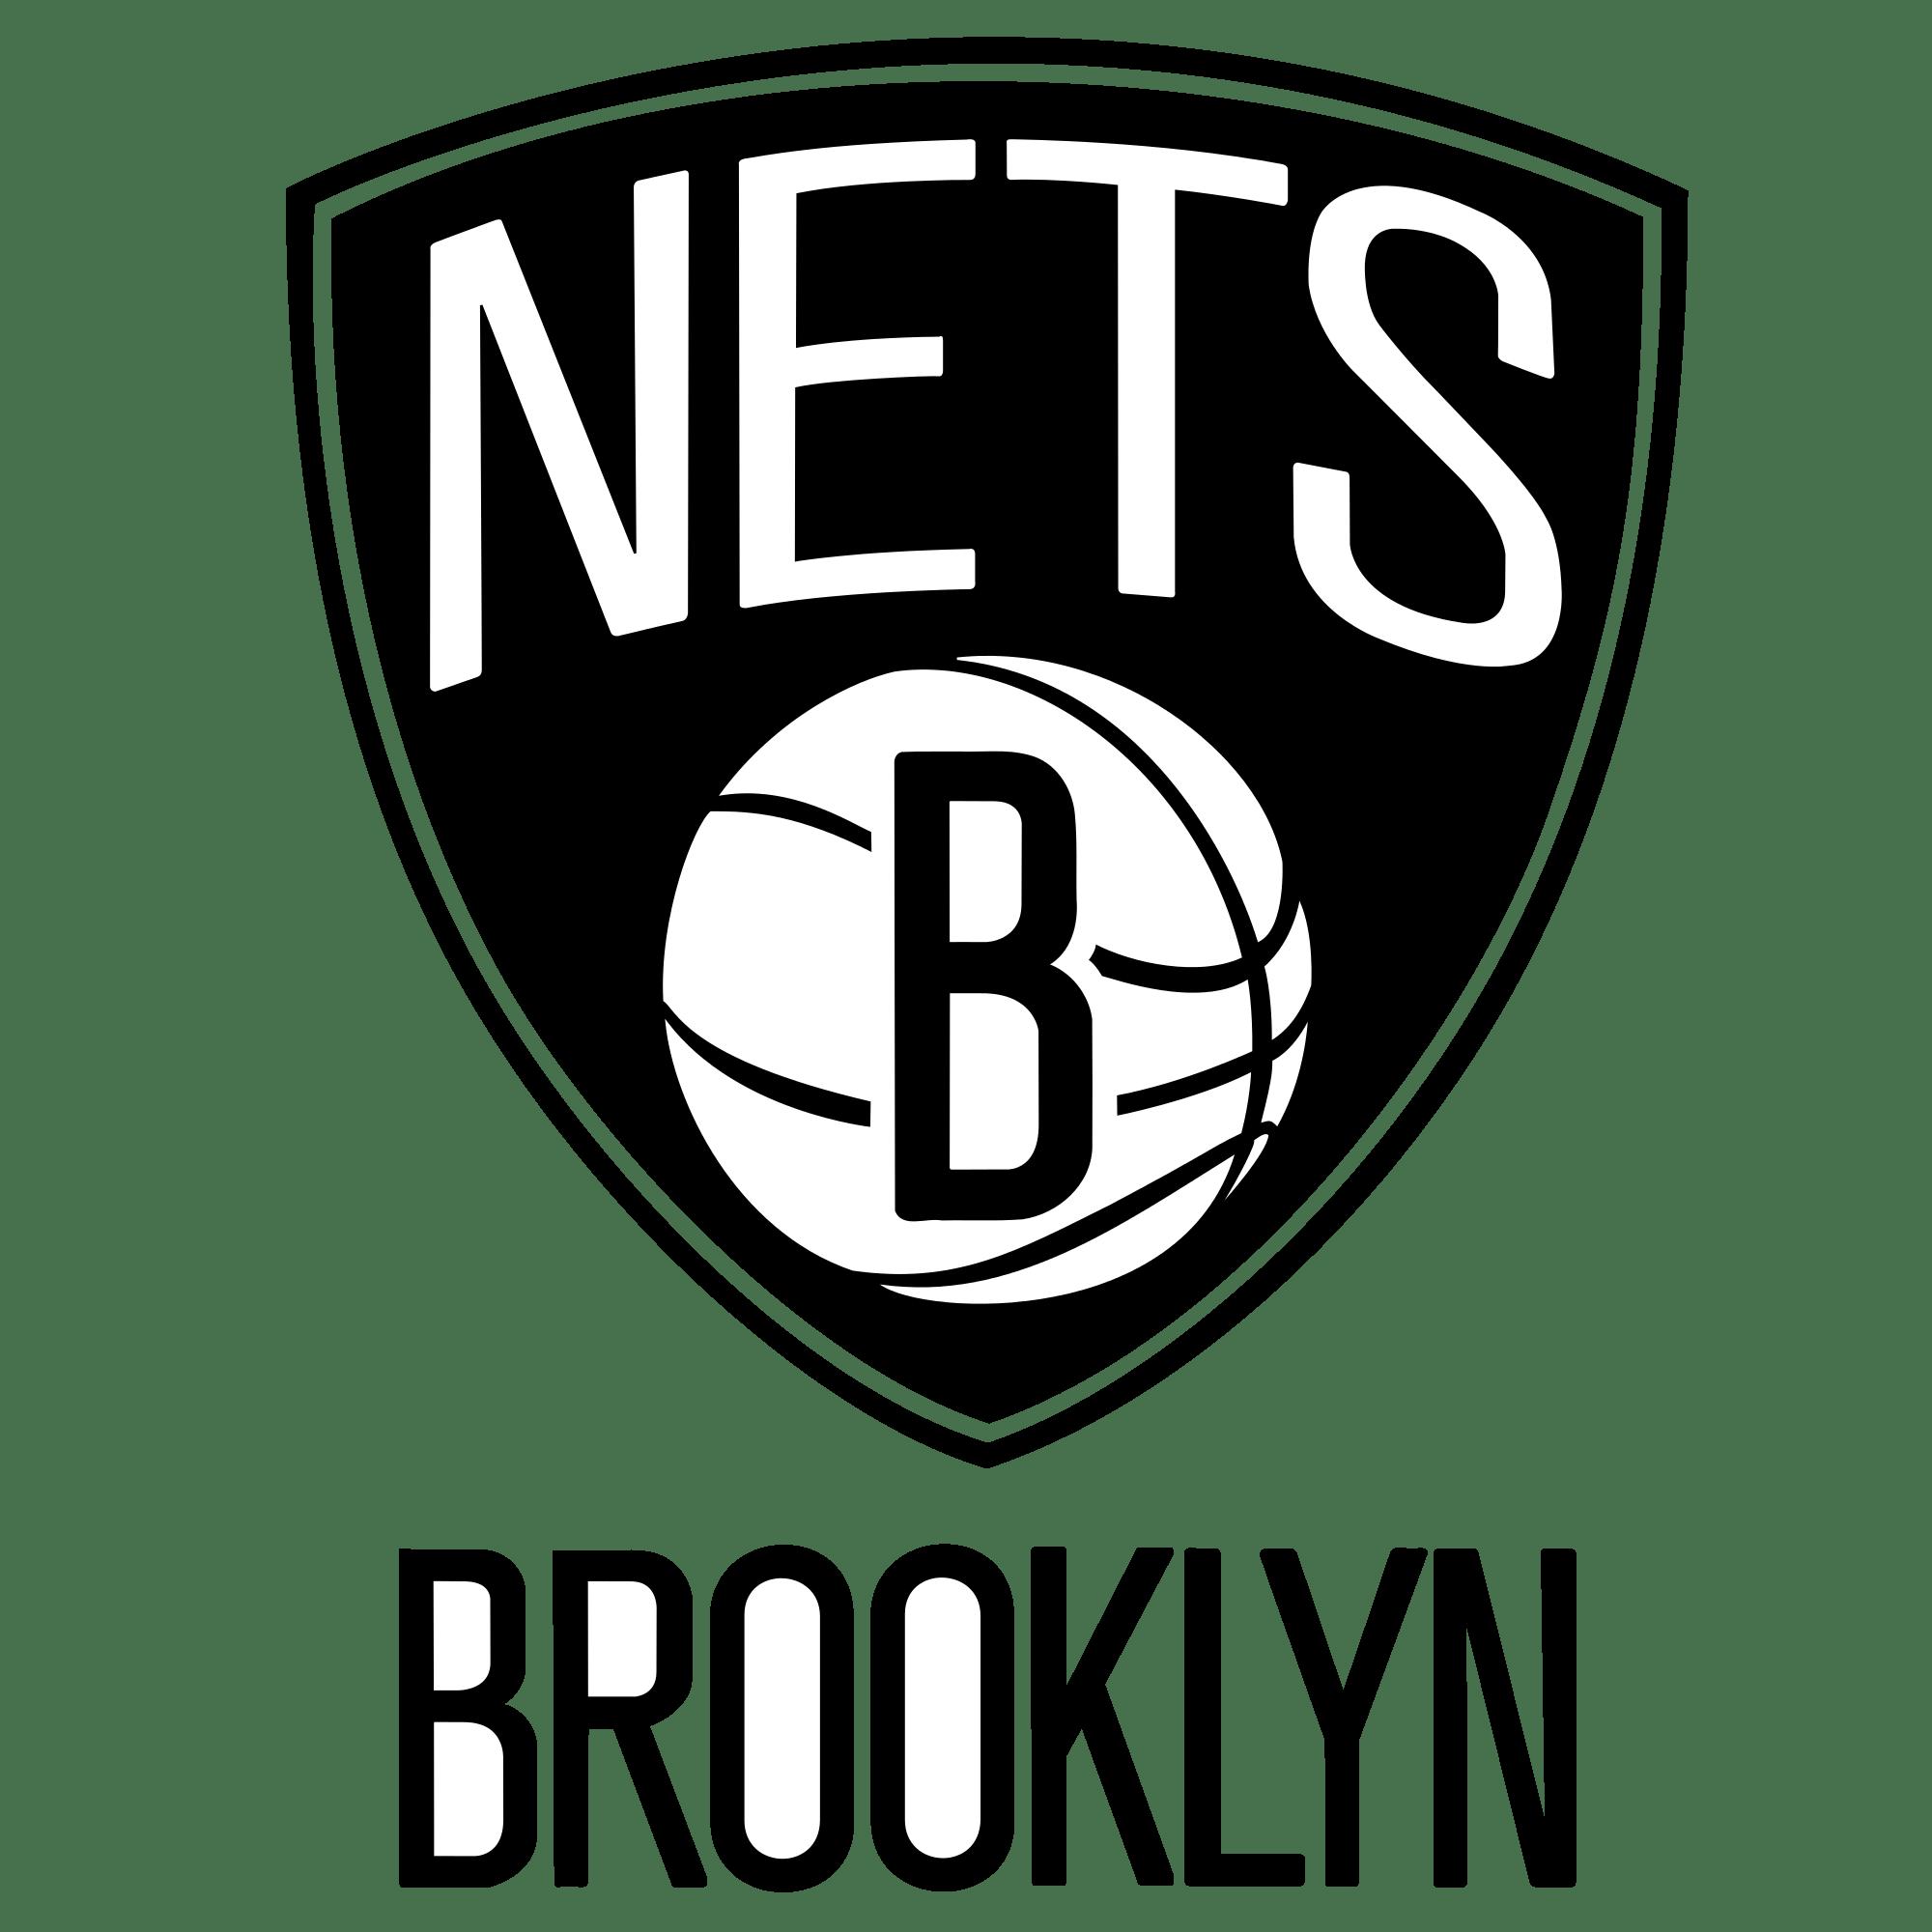 Brooklyn Nets Logo - Brooklyn Nets, Transparent background PNG HD thumbnail